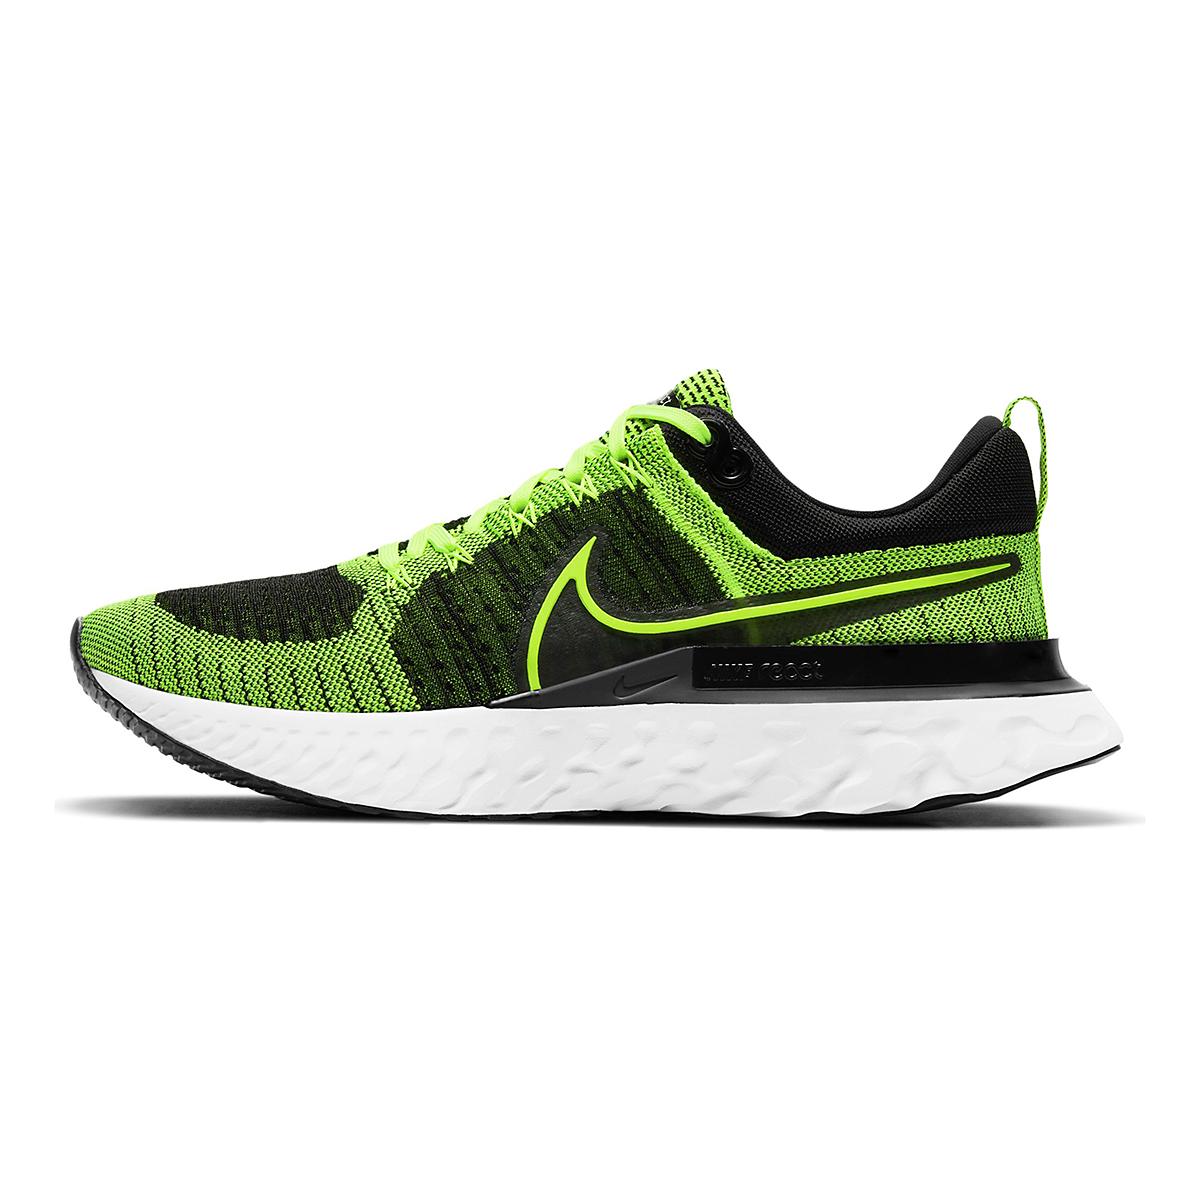 Men's Nike React Infinity Run Flyknit 2 Running Shoe - Color: Volt/Black - Size: 6 - Width: Regular, Volt/Black, large, image 2